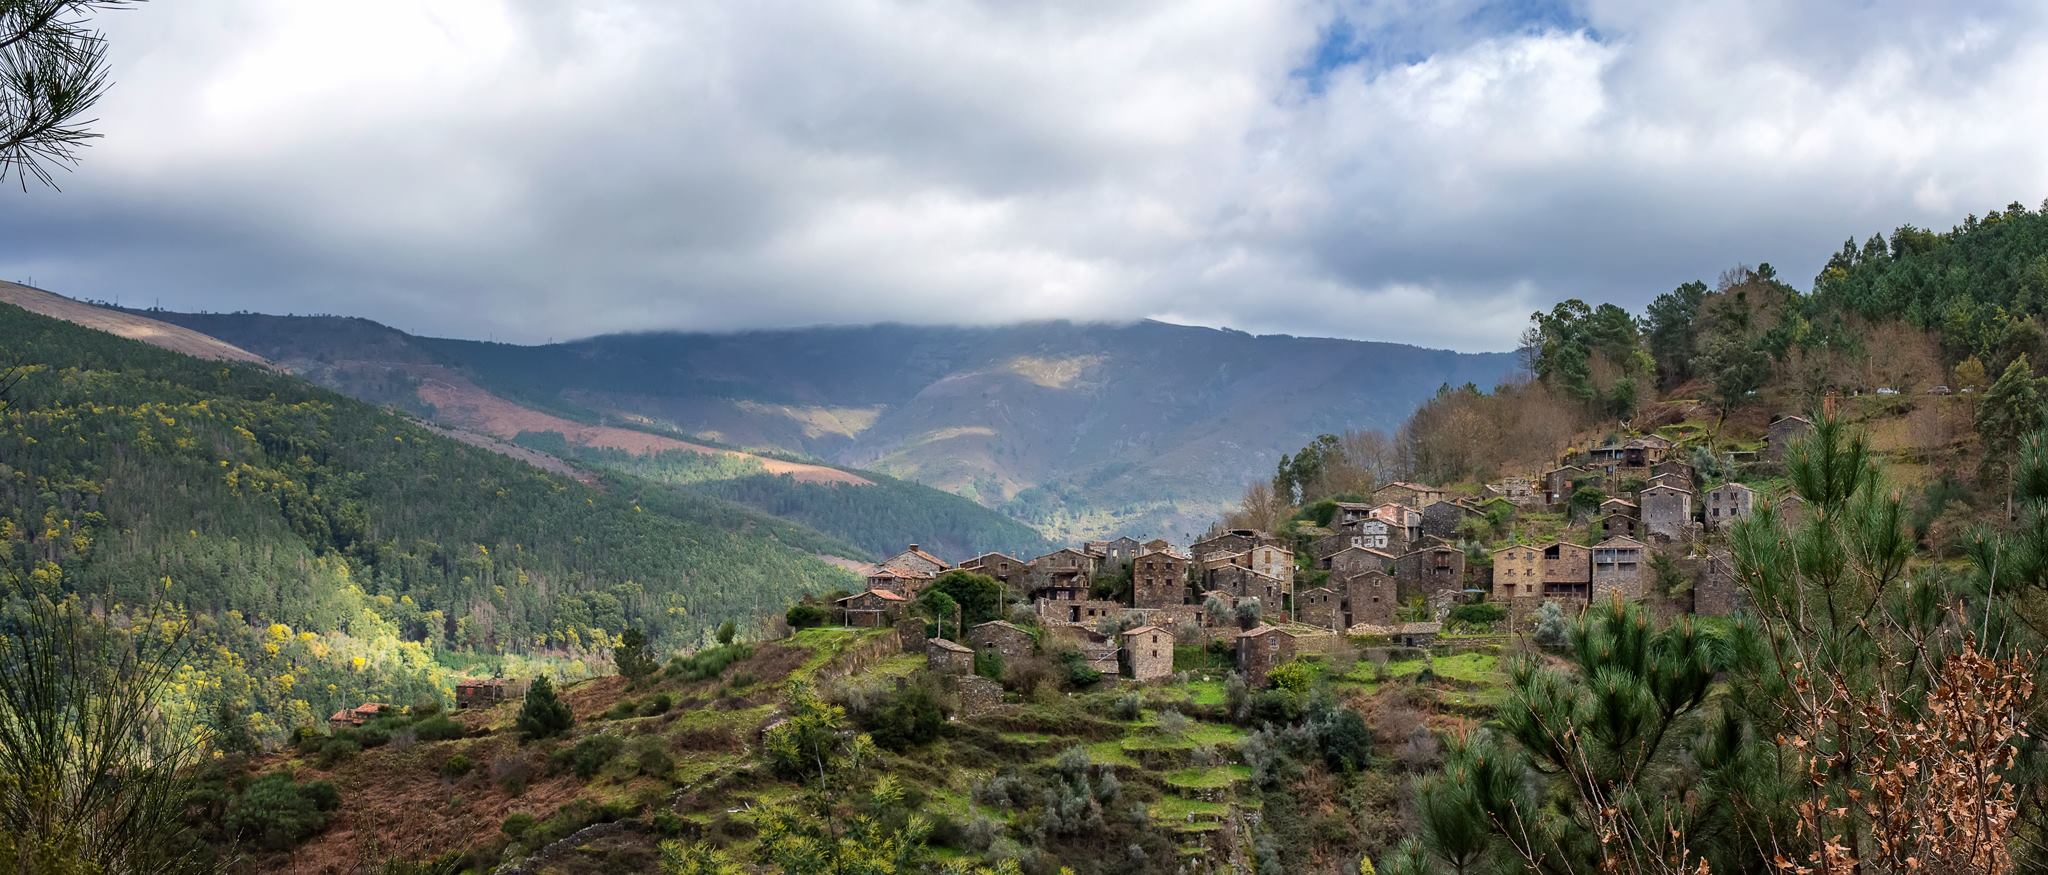 Trekking Talasnal e Casal Novo